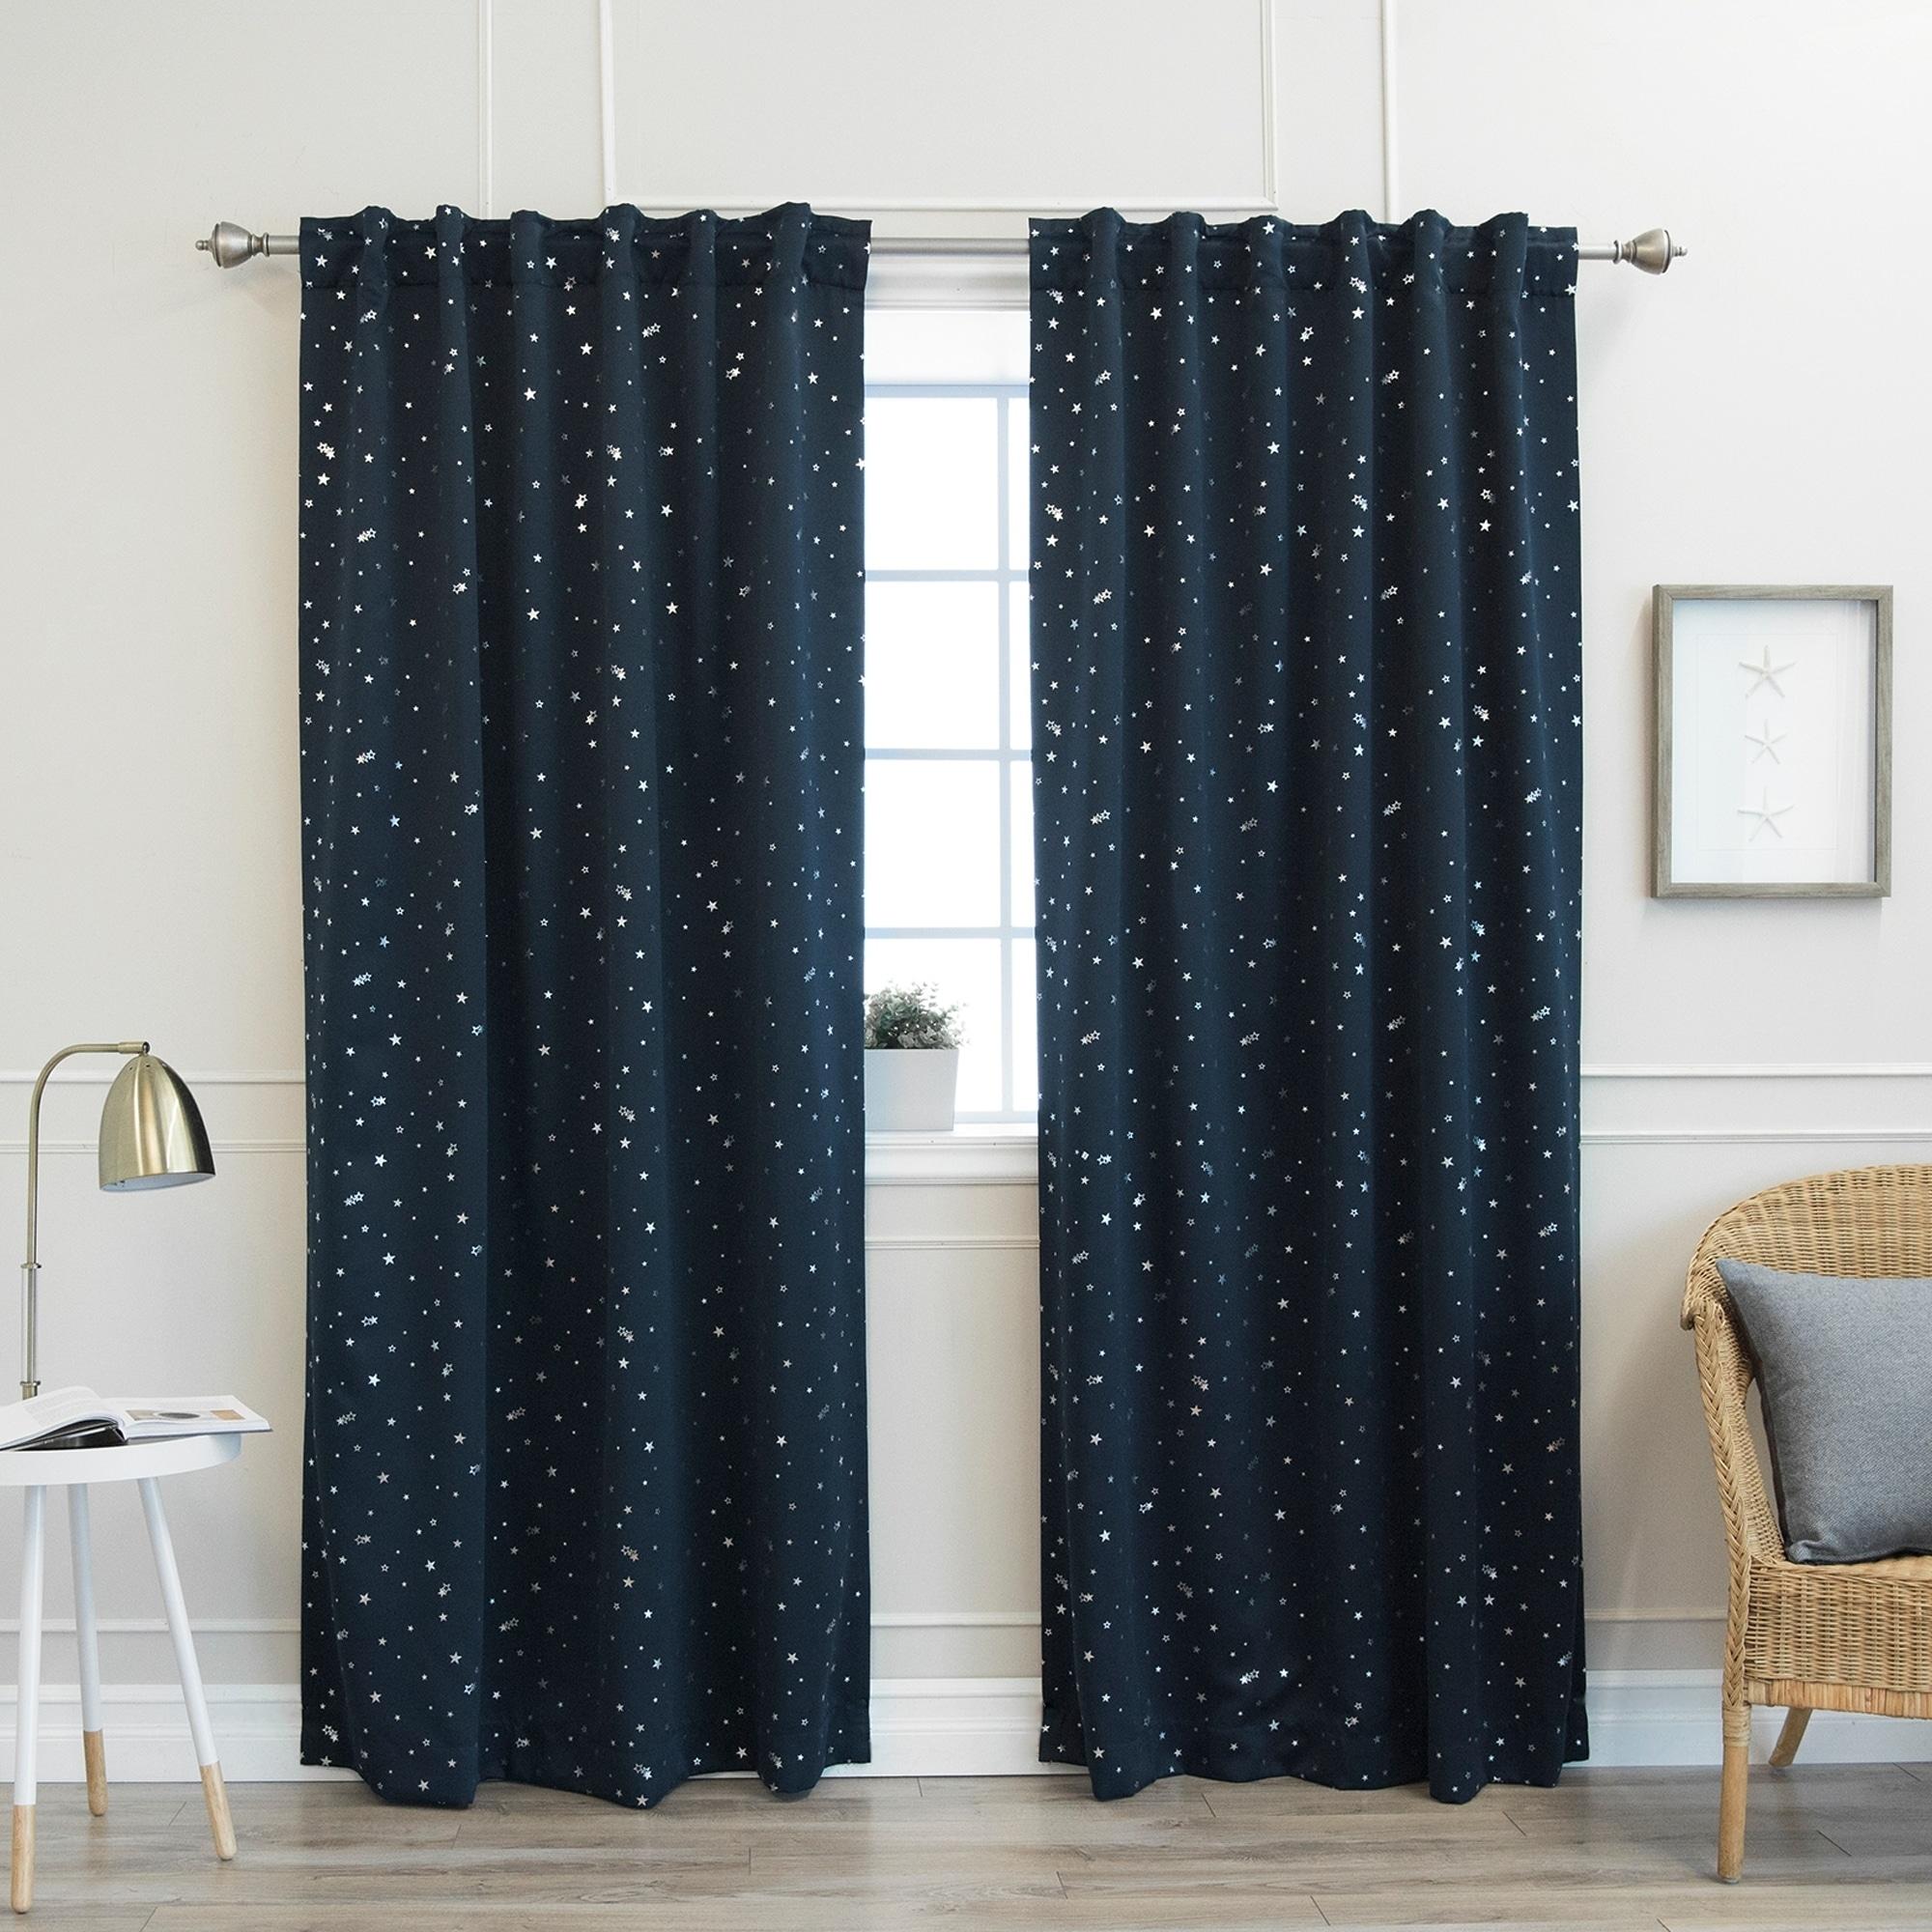 in burst panel inspirational rod of crayola inch luxury window cosmic curtains curtain pocket white